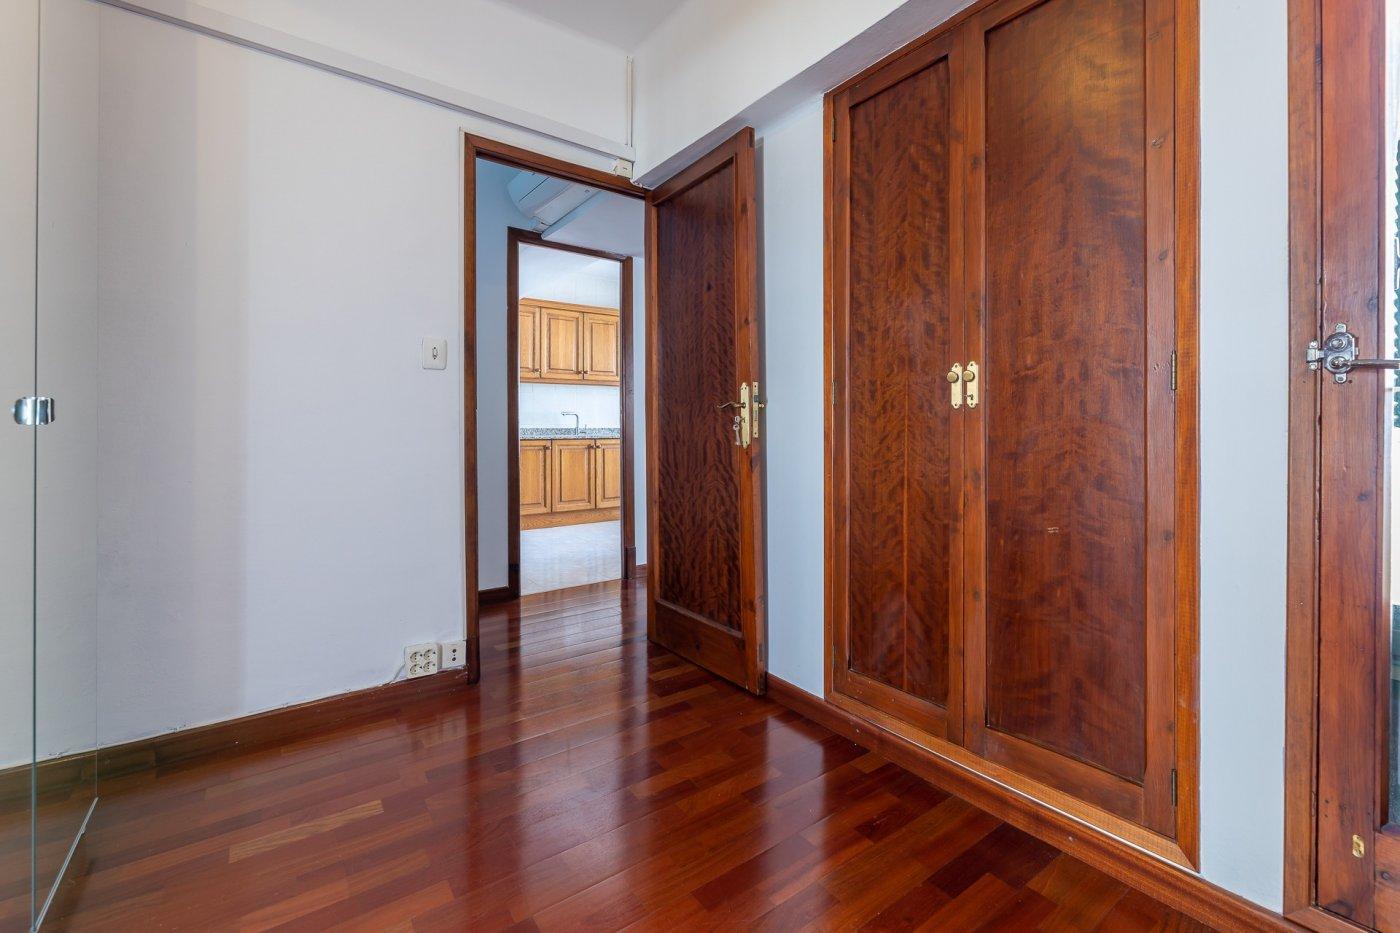 Segundo piso sin ascensor junto a la plaza abu yaya. - imagenInmueble21